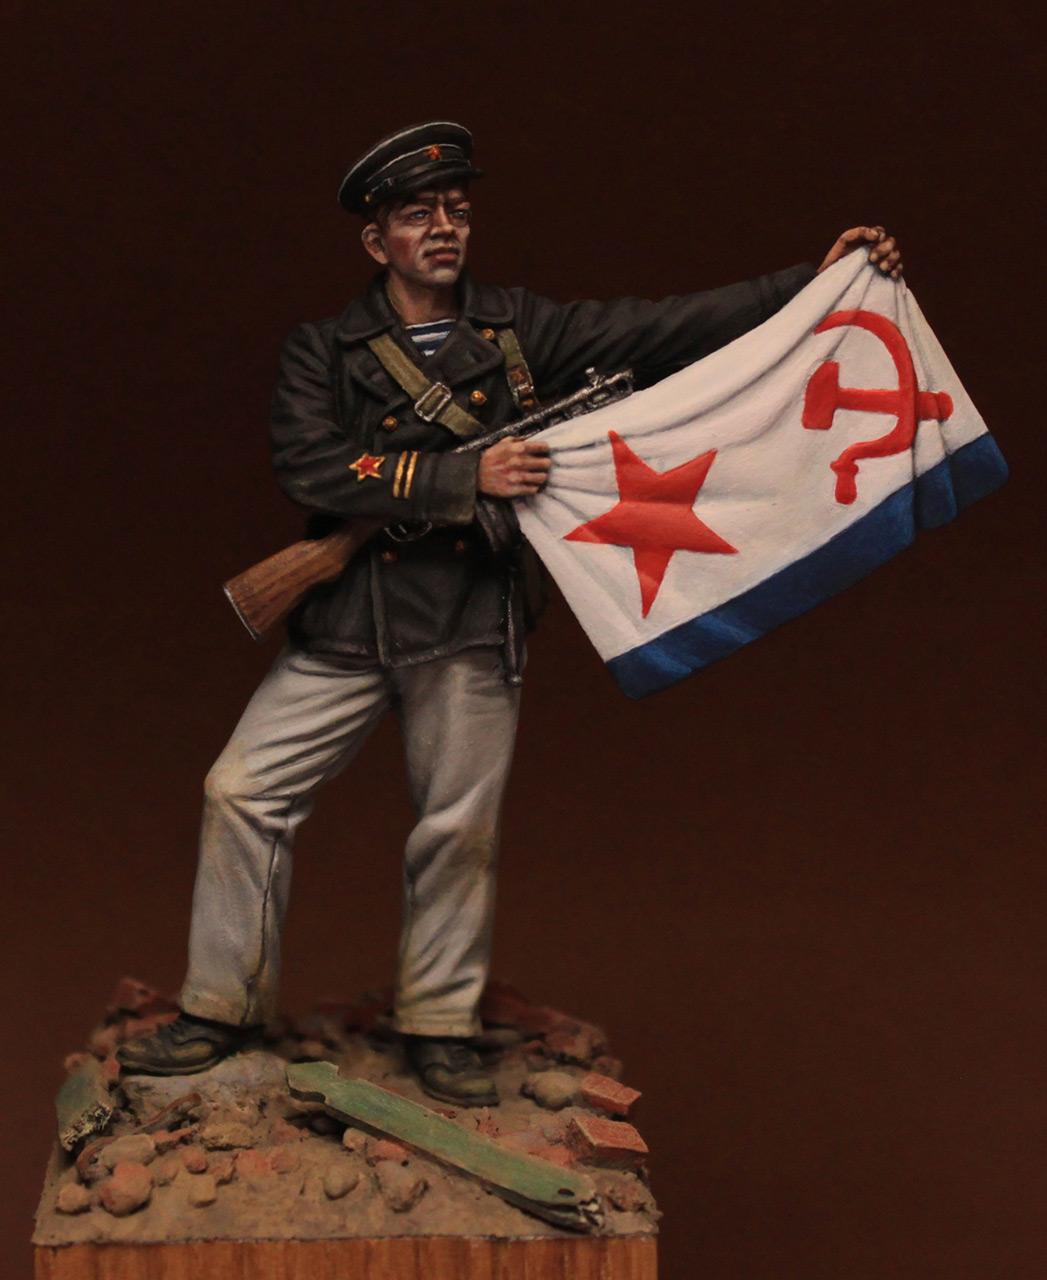 Figures: Petty officer 1st class, Soviet marines, 1942, photo #1